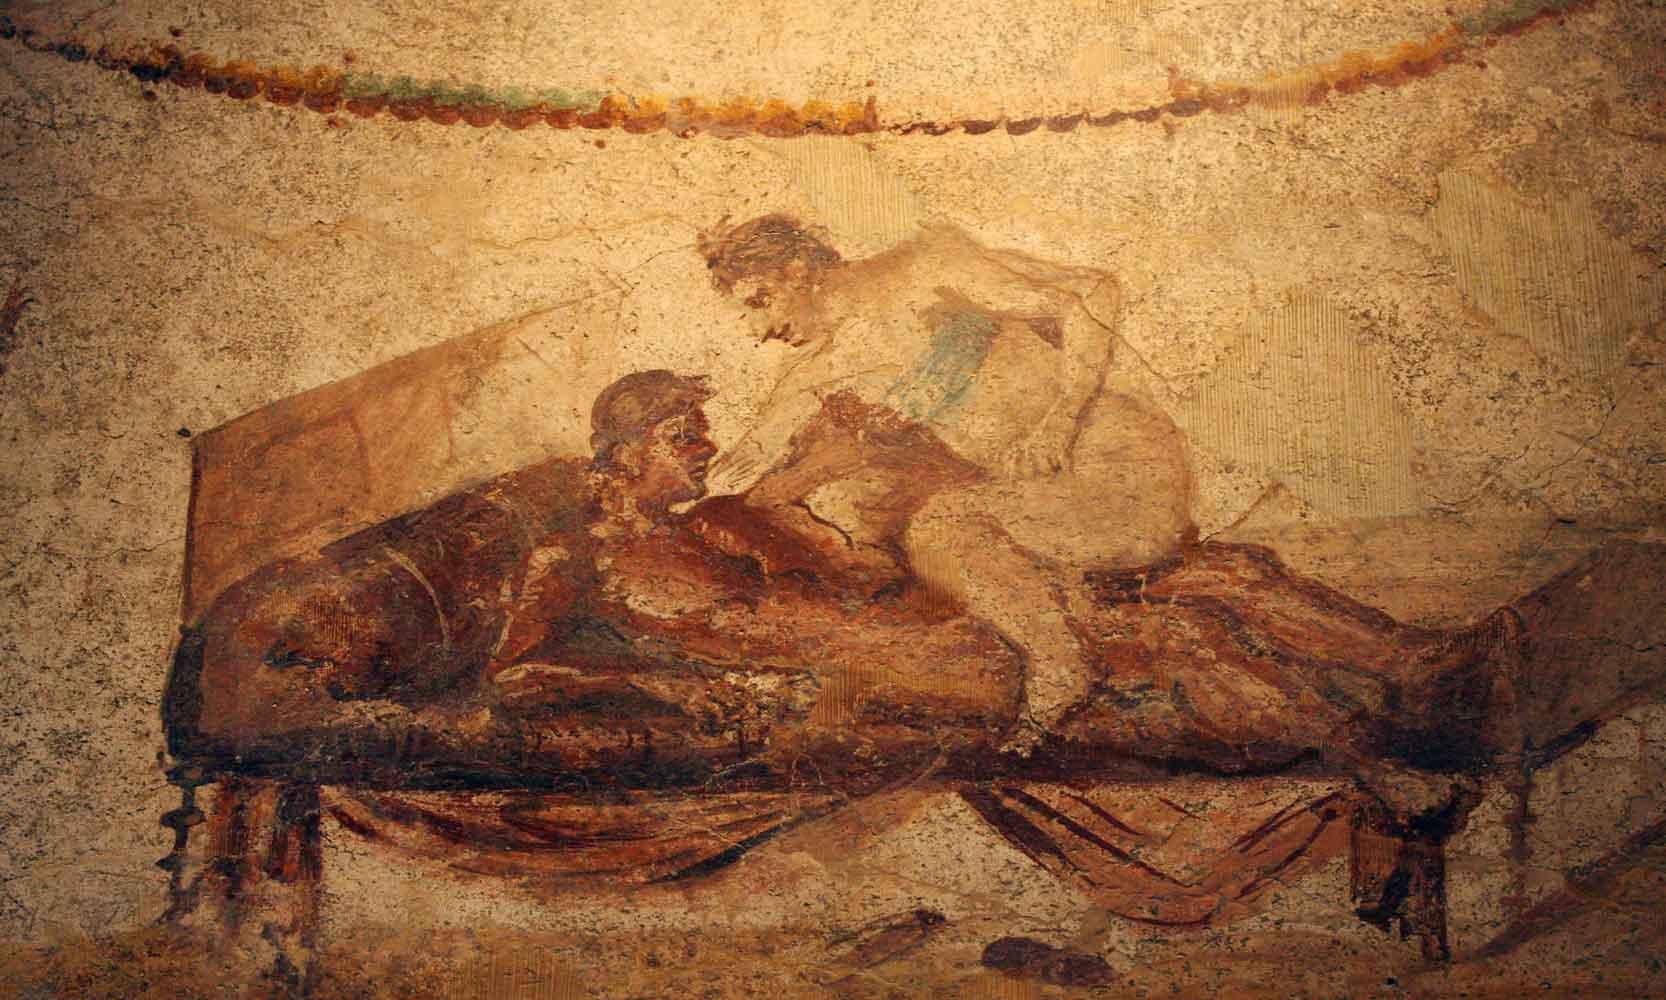 Picture taken 26 October 2006 of an erotic fresco in Pompeii